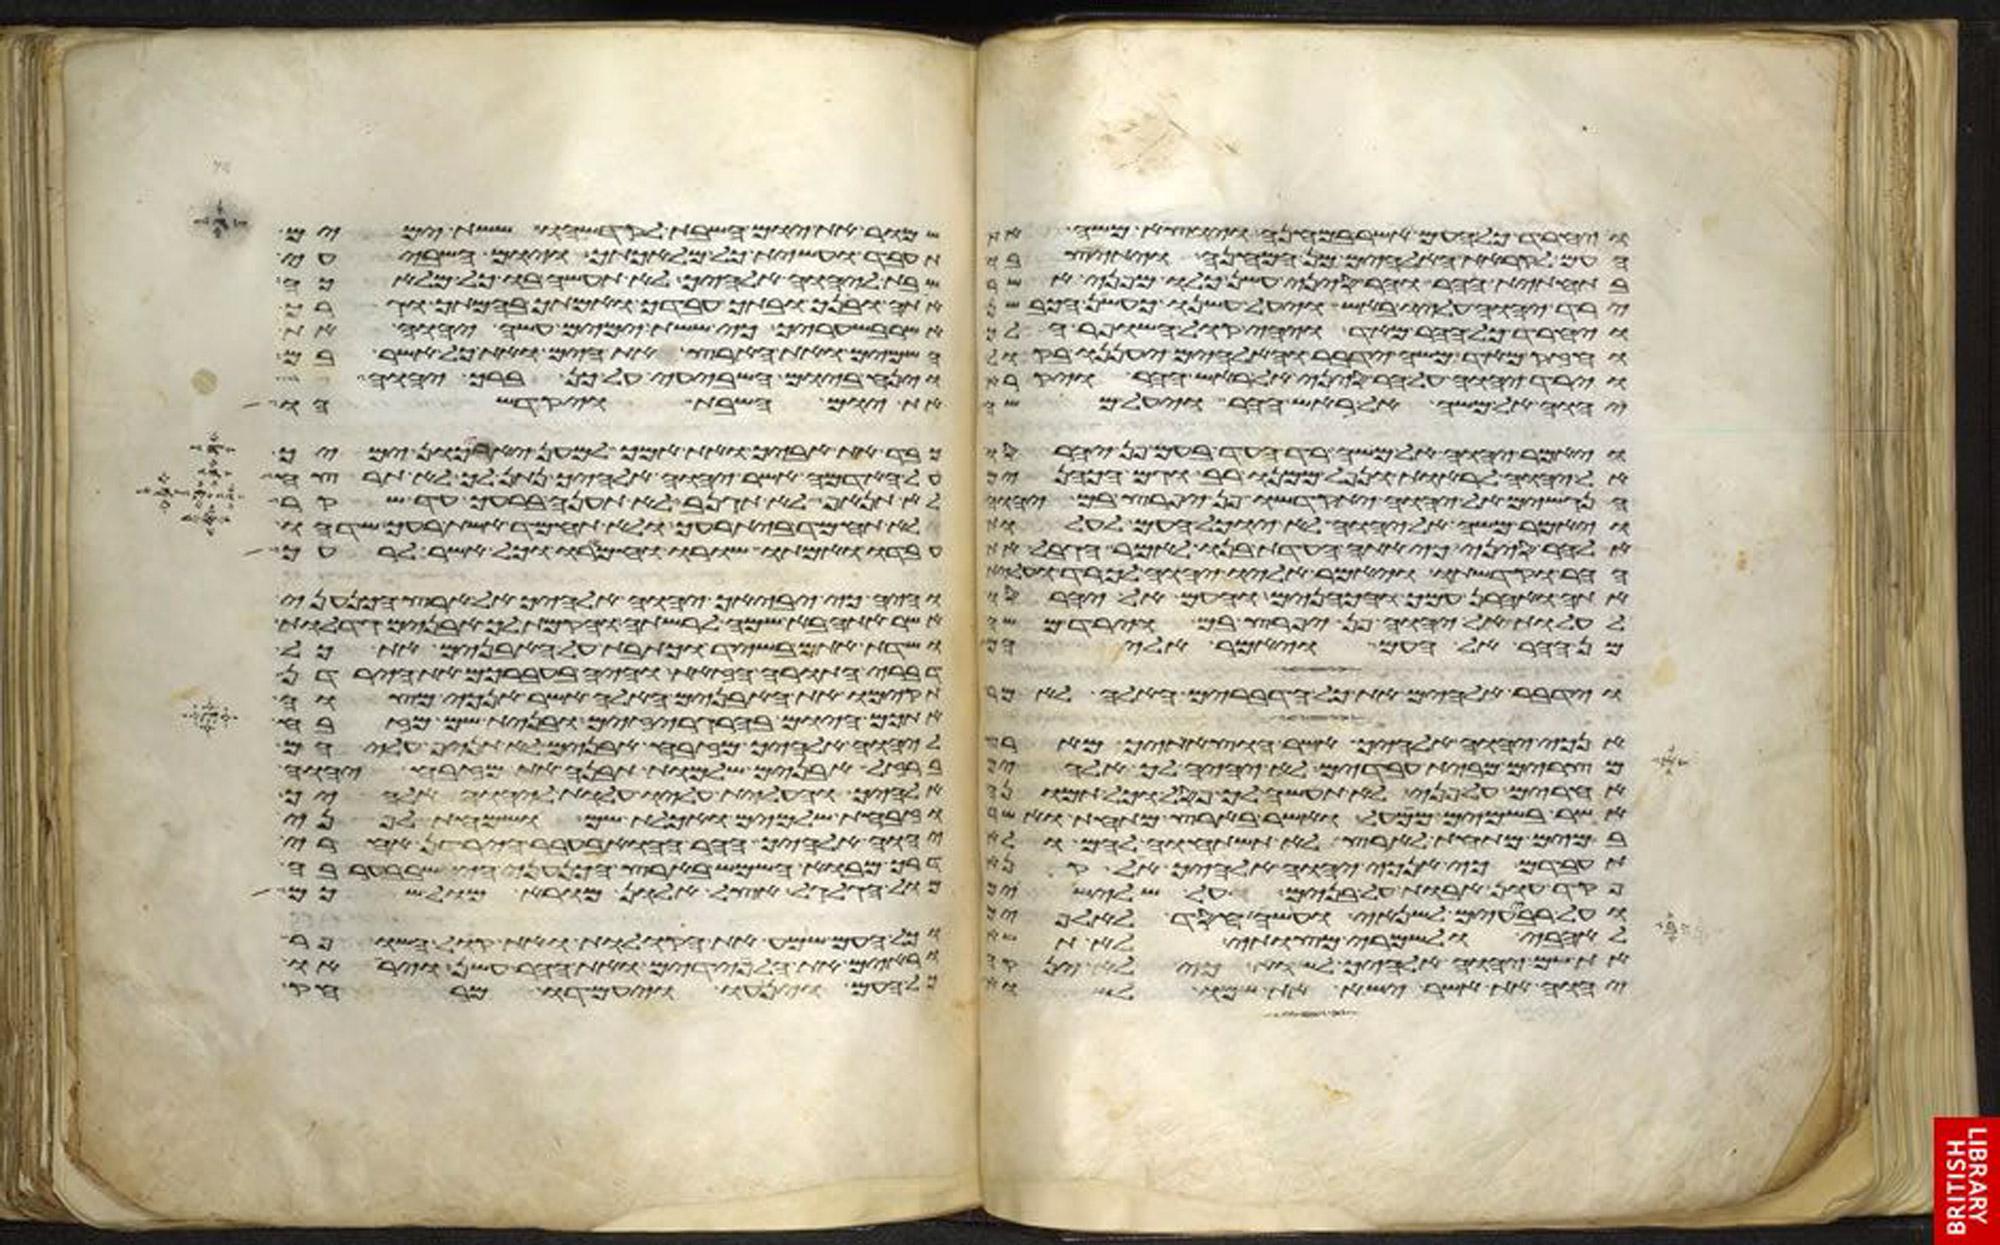 Samaritan Pentateuch - The British Library